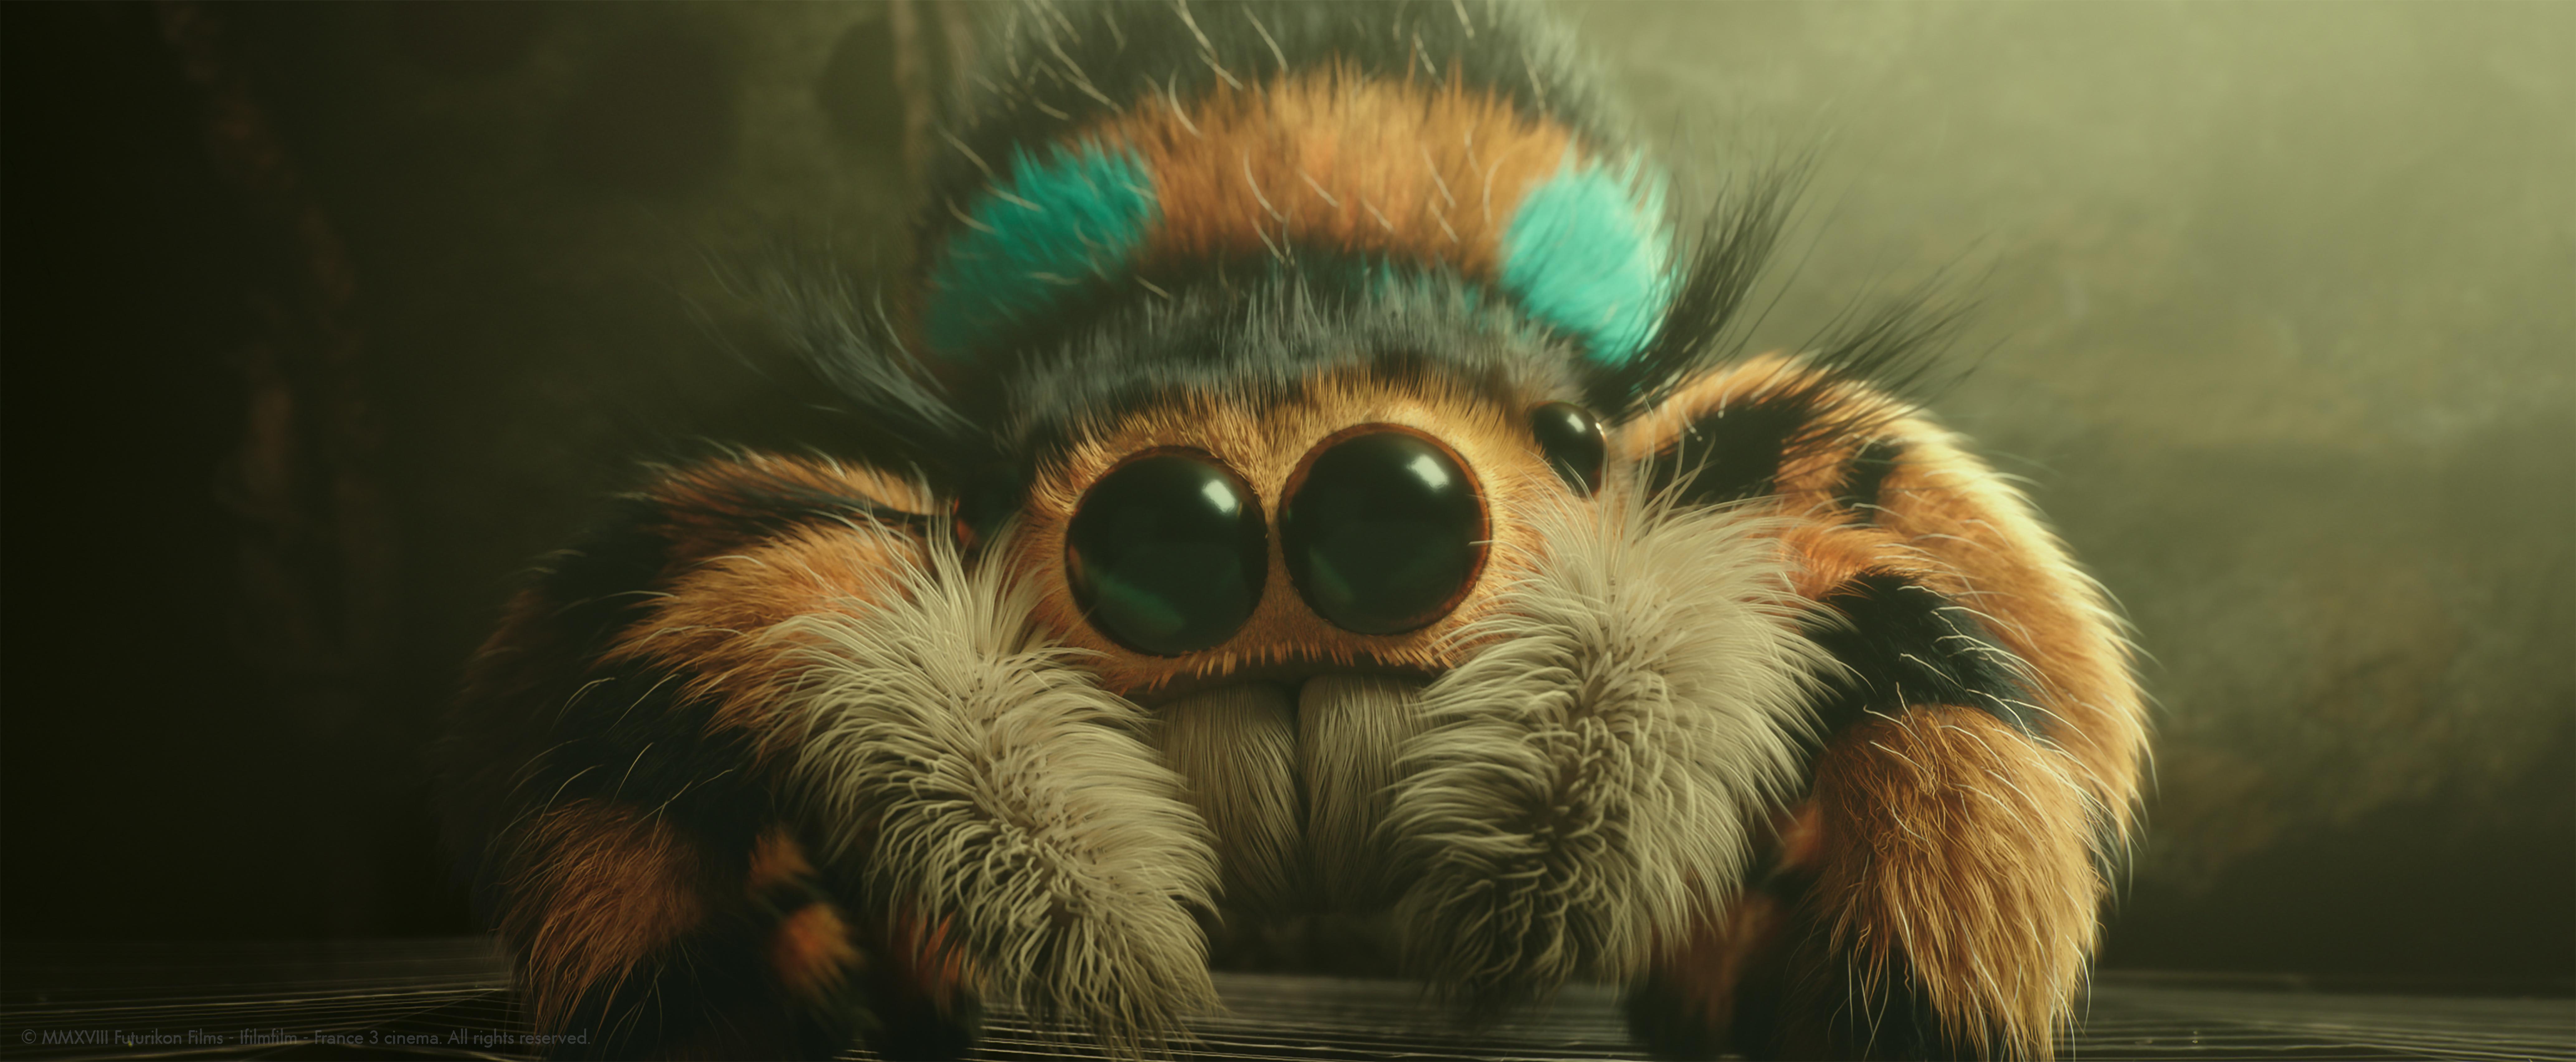 Кадр из мультфильма «Букашки 2»